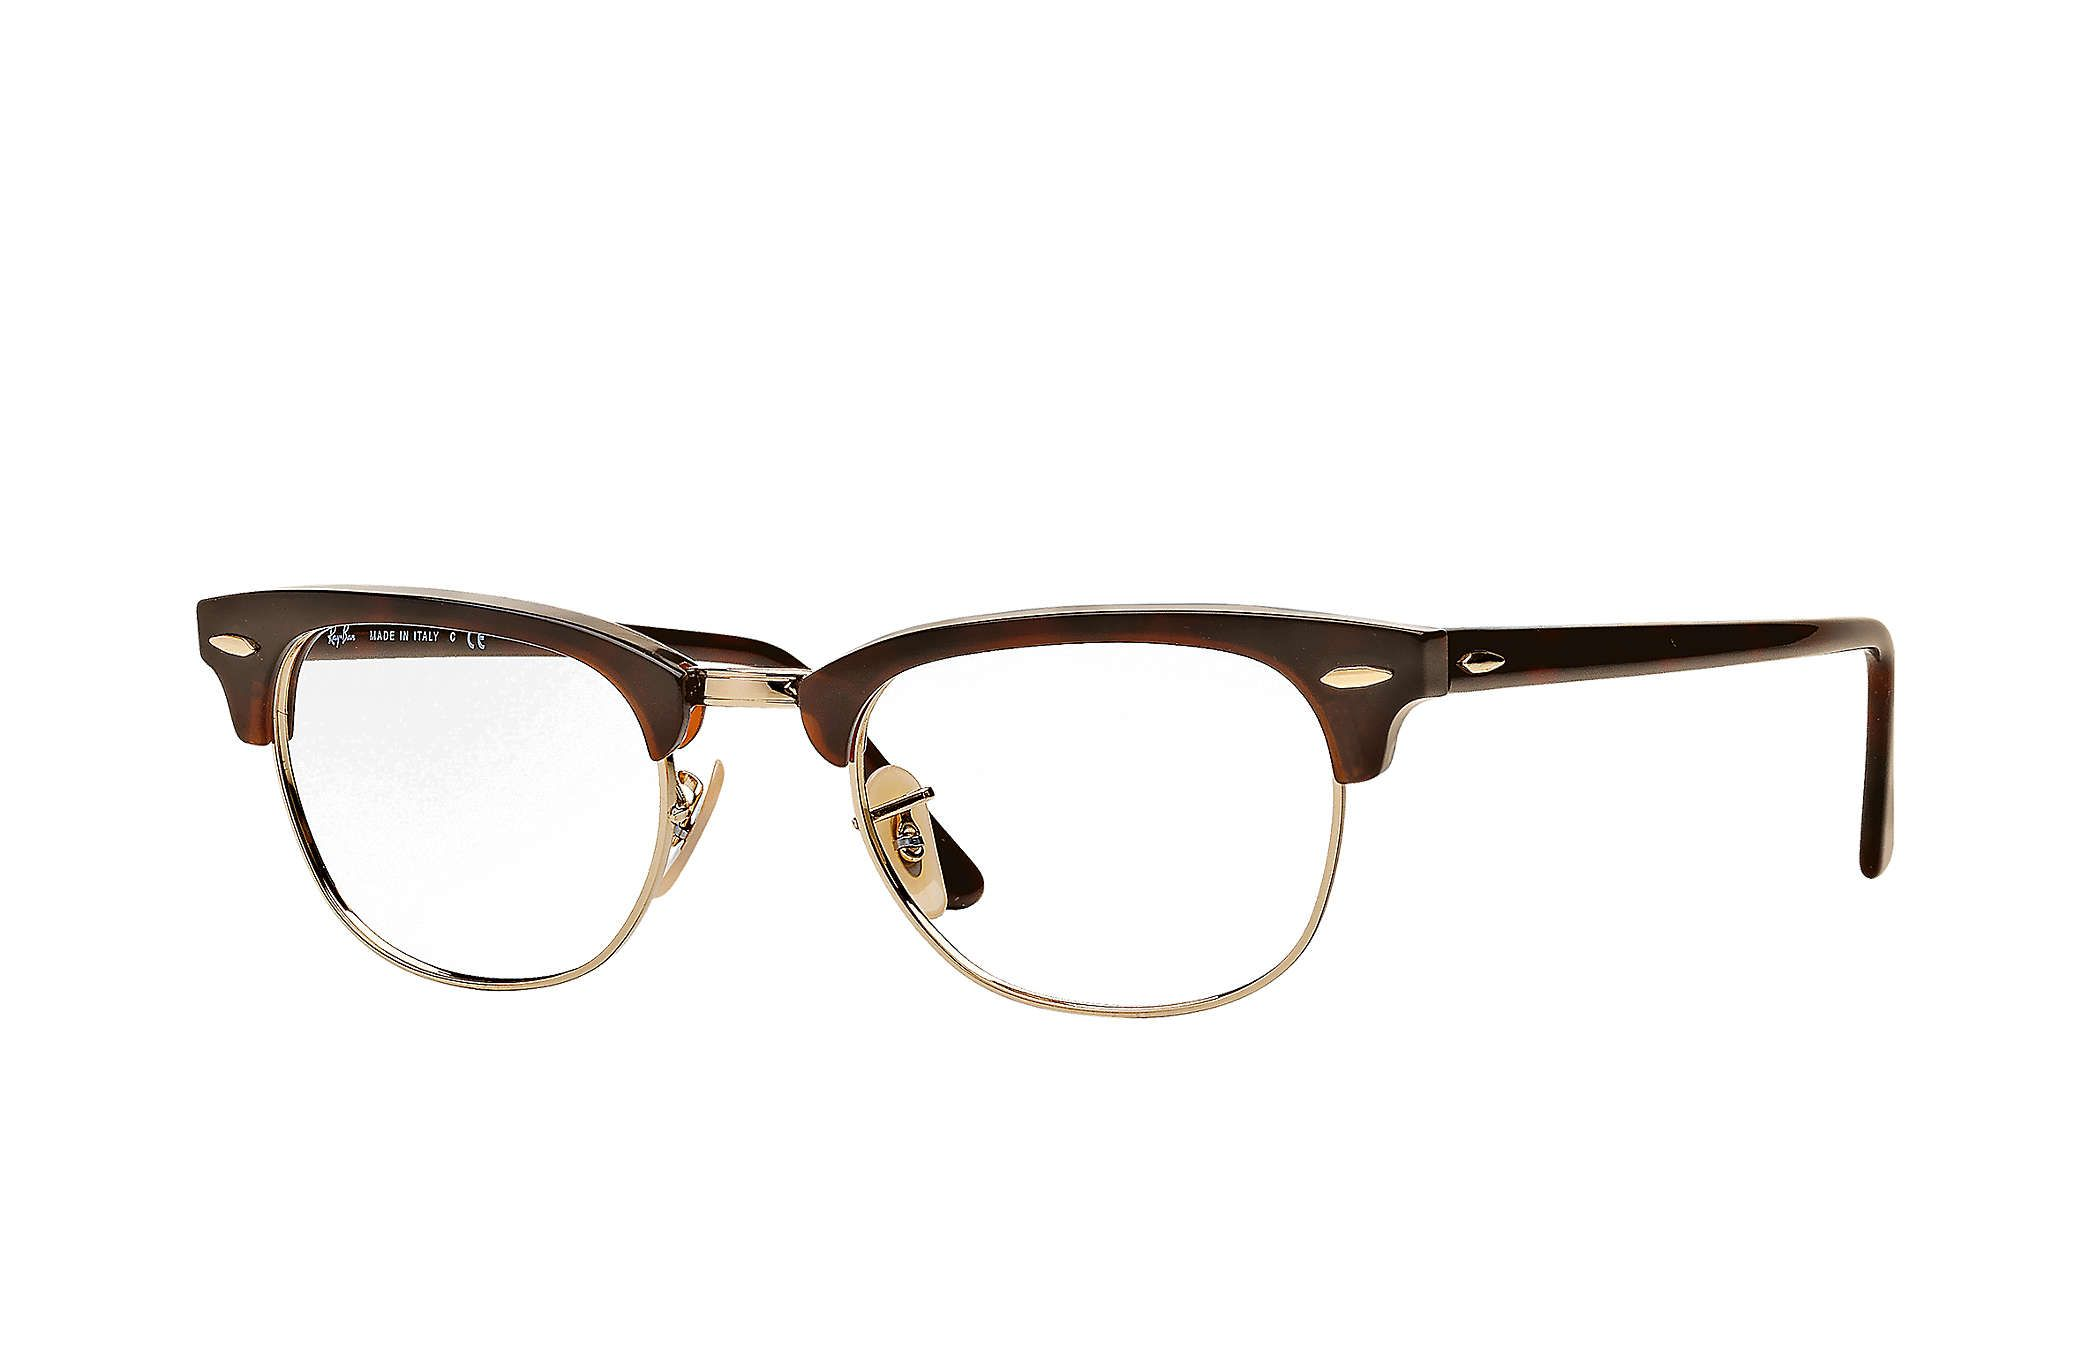 mens prescription ray ban sunglasses uk